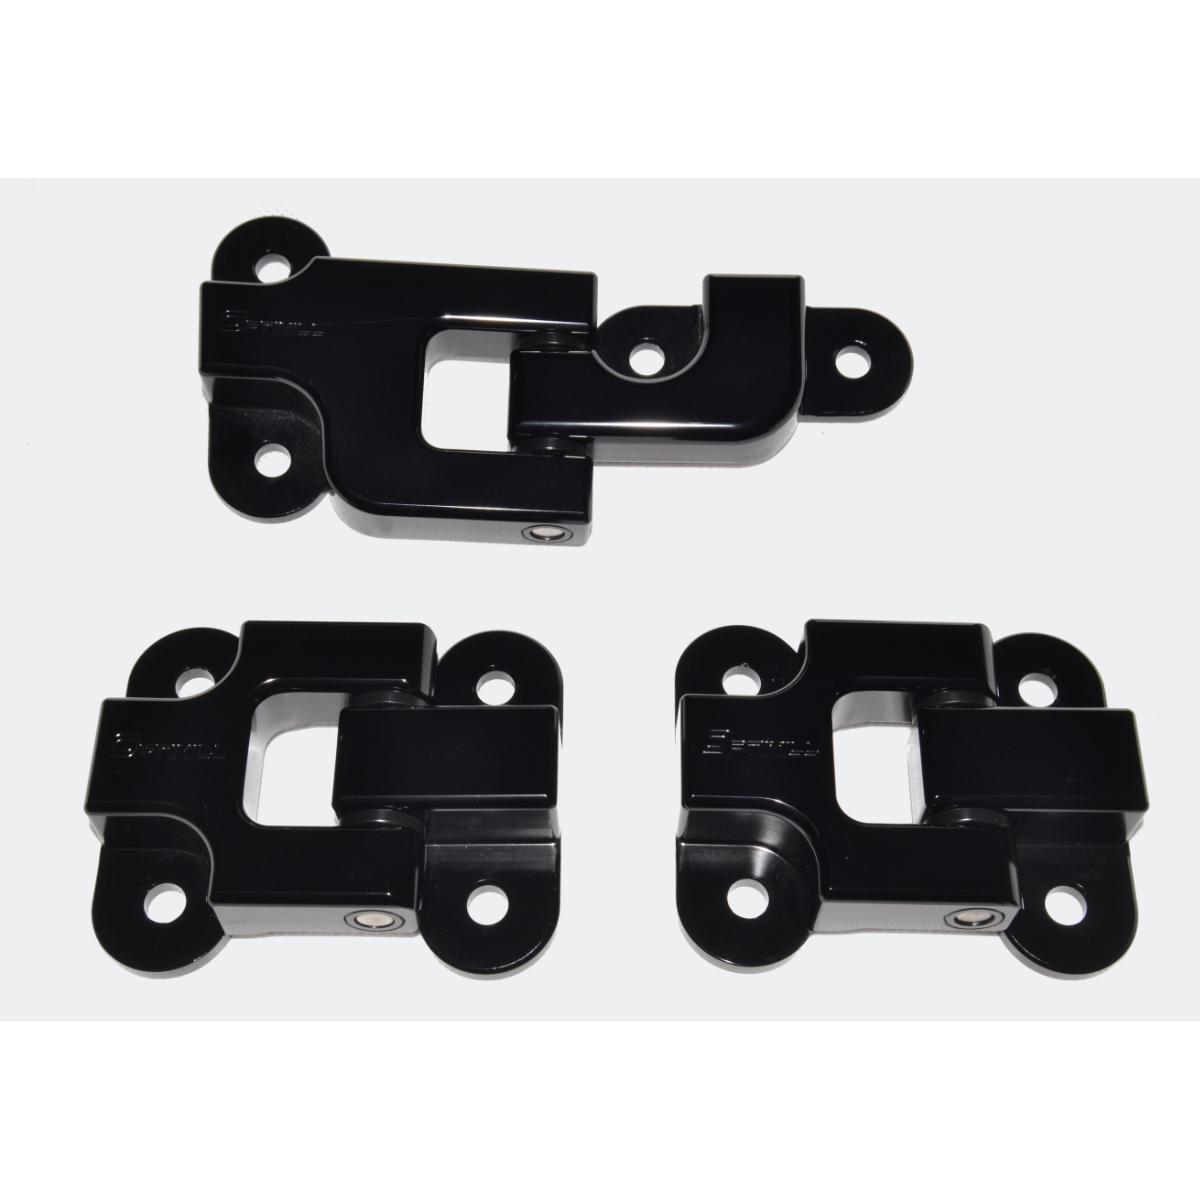 land-rover-defender-rear-door-hinges-set-3-black